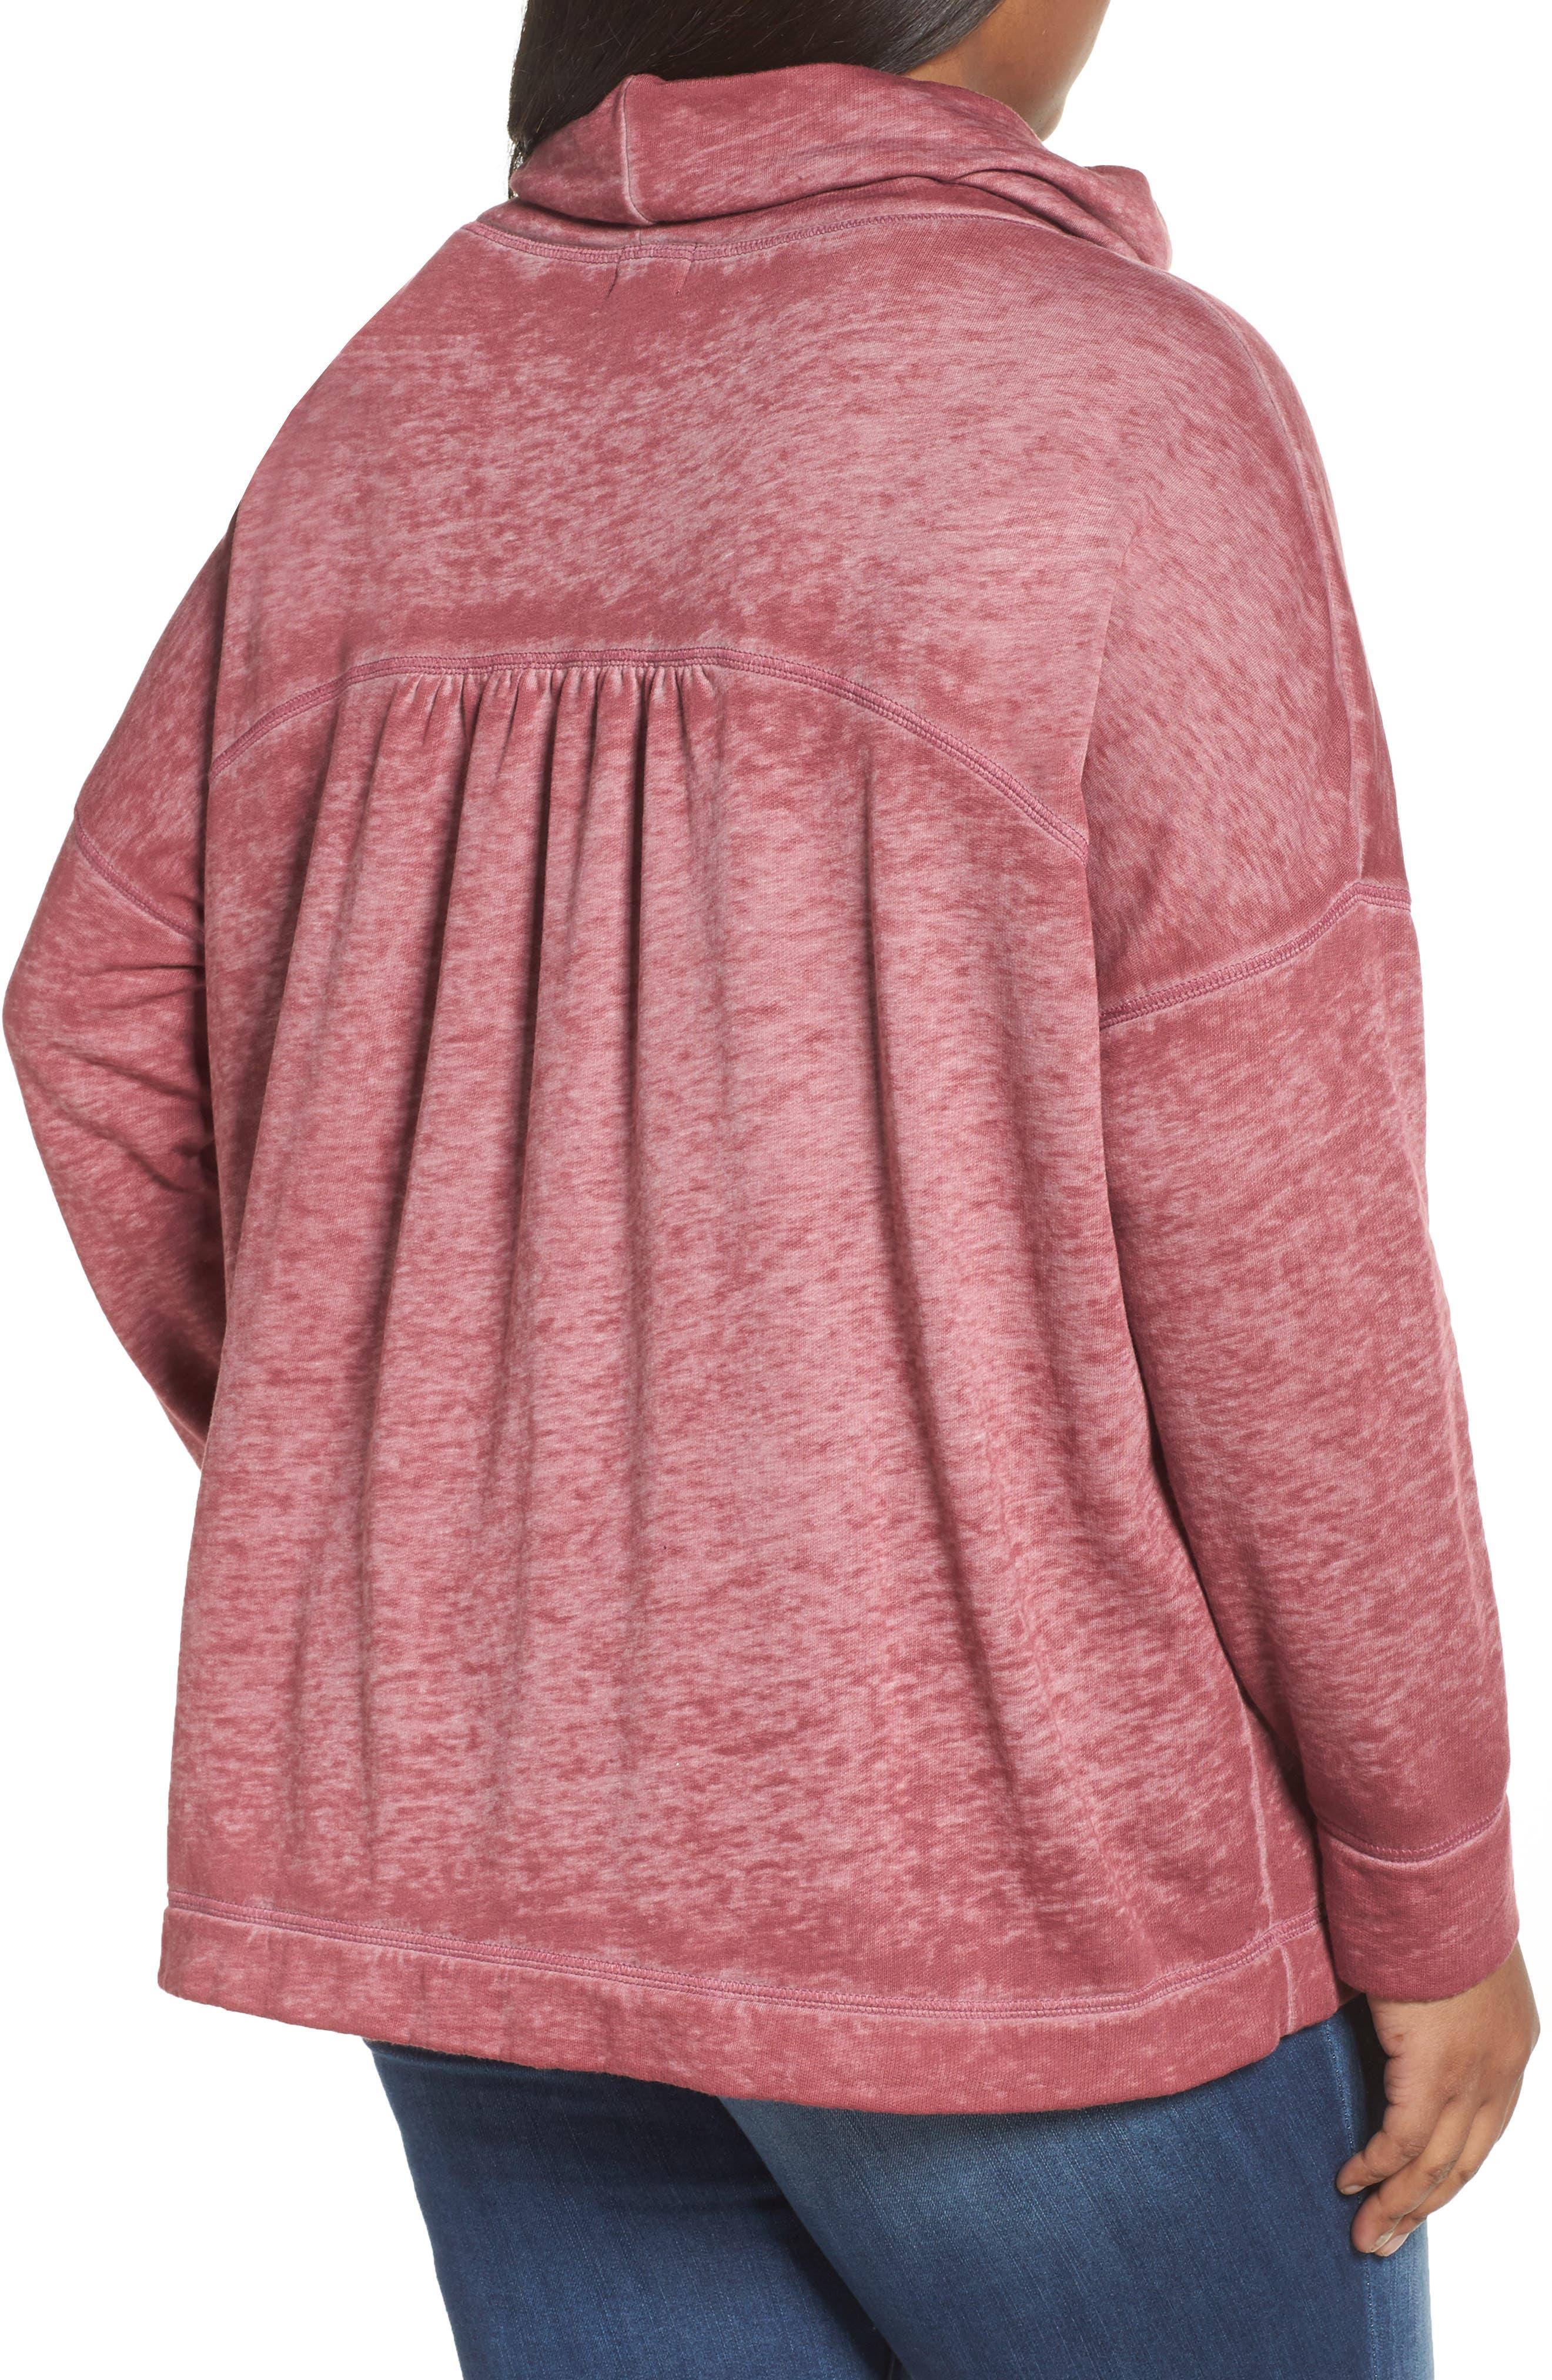 Pleat Back Sweatshirt,                             Alternate thumbnail 2, color,                             Burgundy Thorn